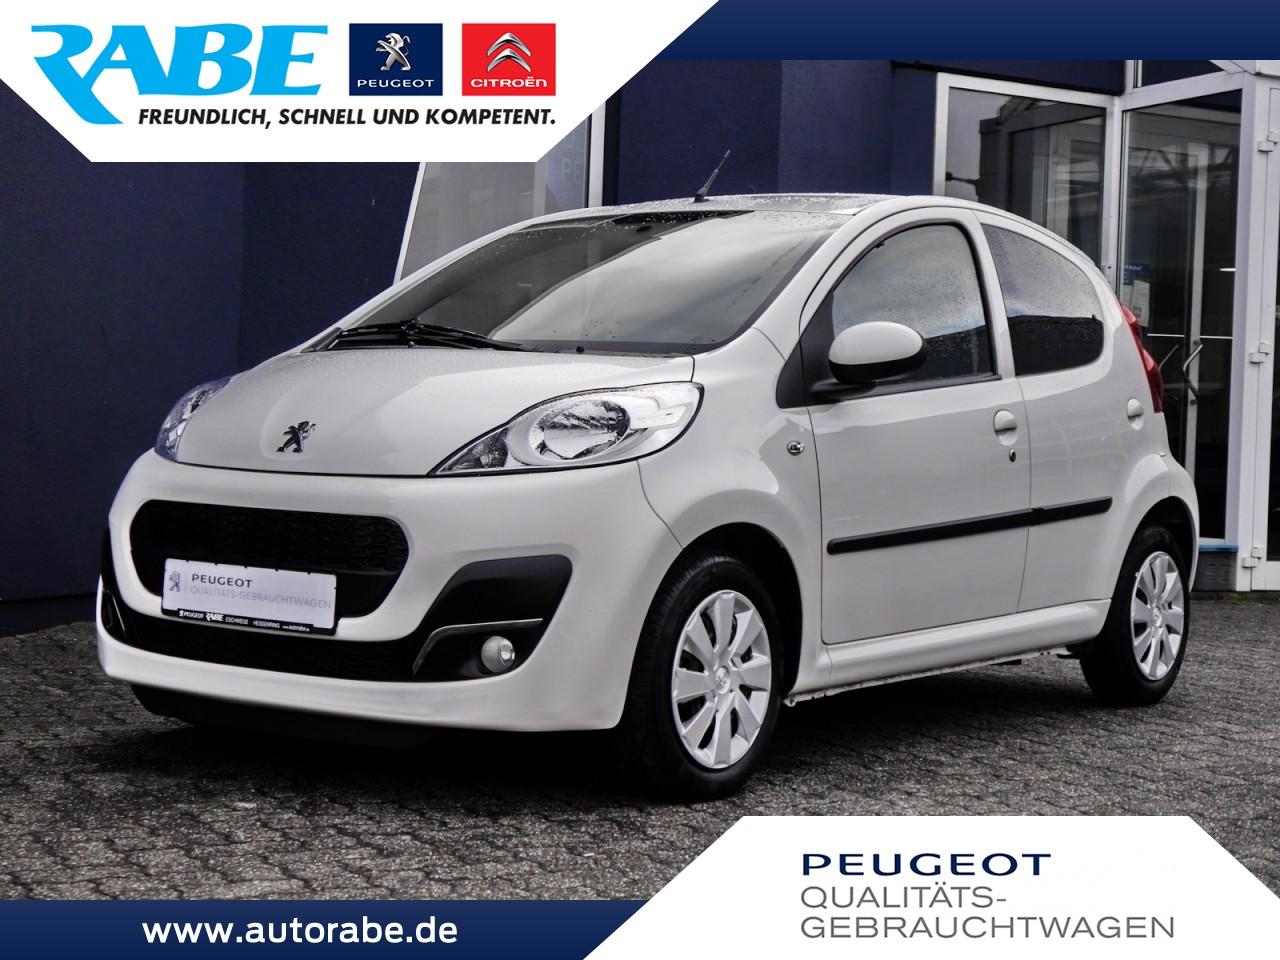 Peugeot 107 Active 68 VTi Klima+Privacy-Glass+5-Türer, Jahr 2012, petrol